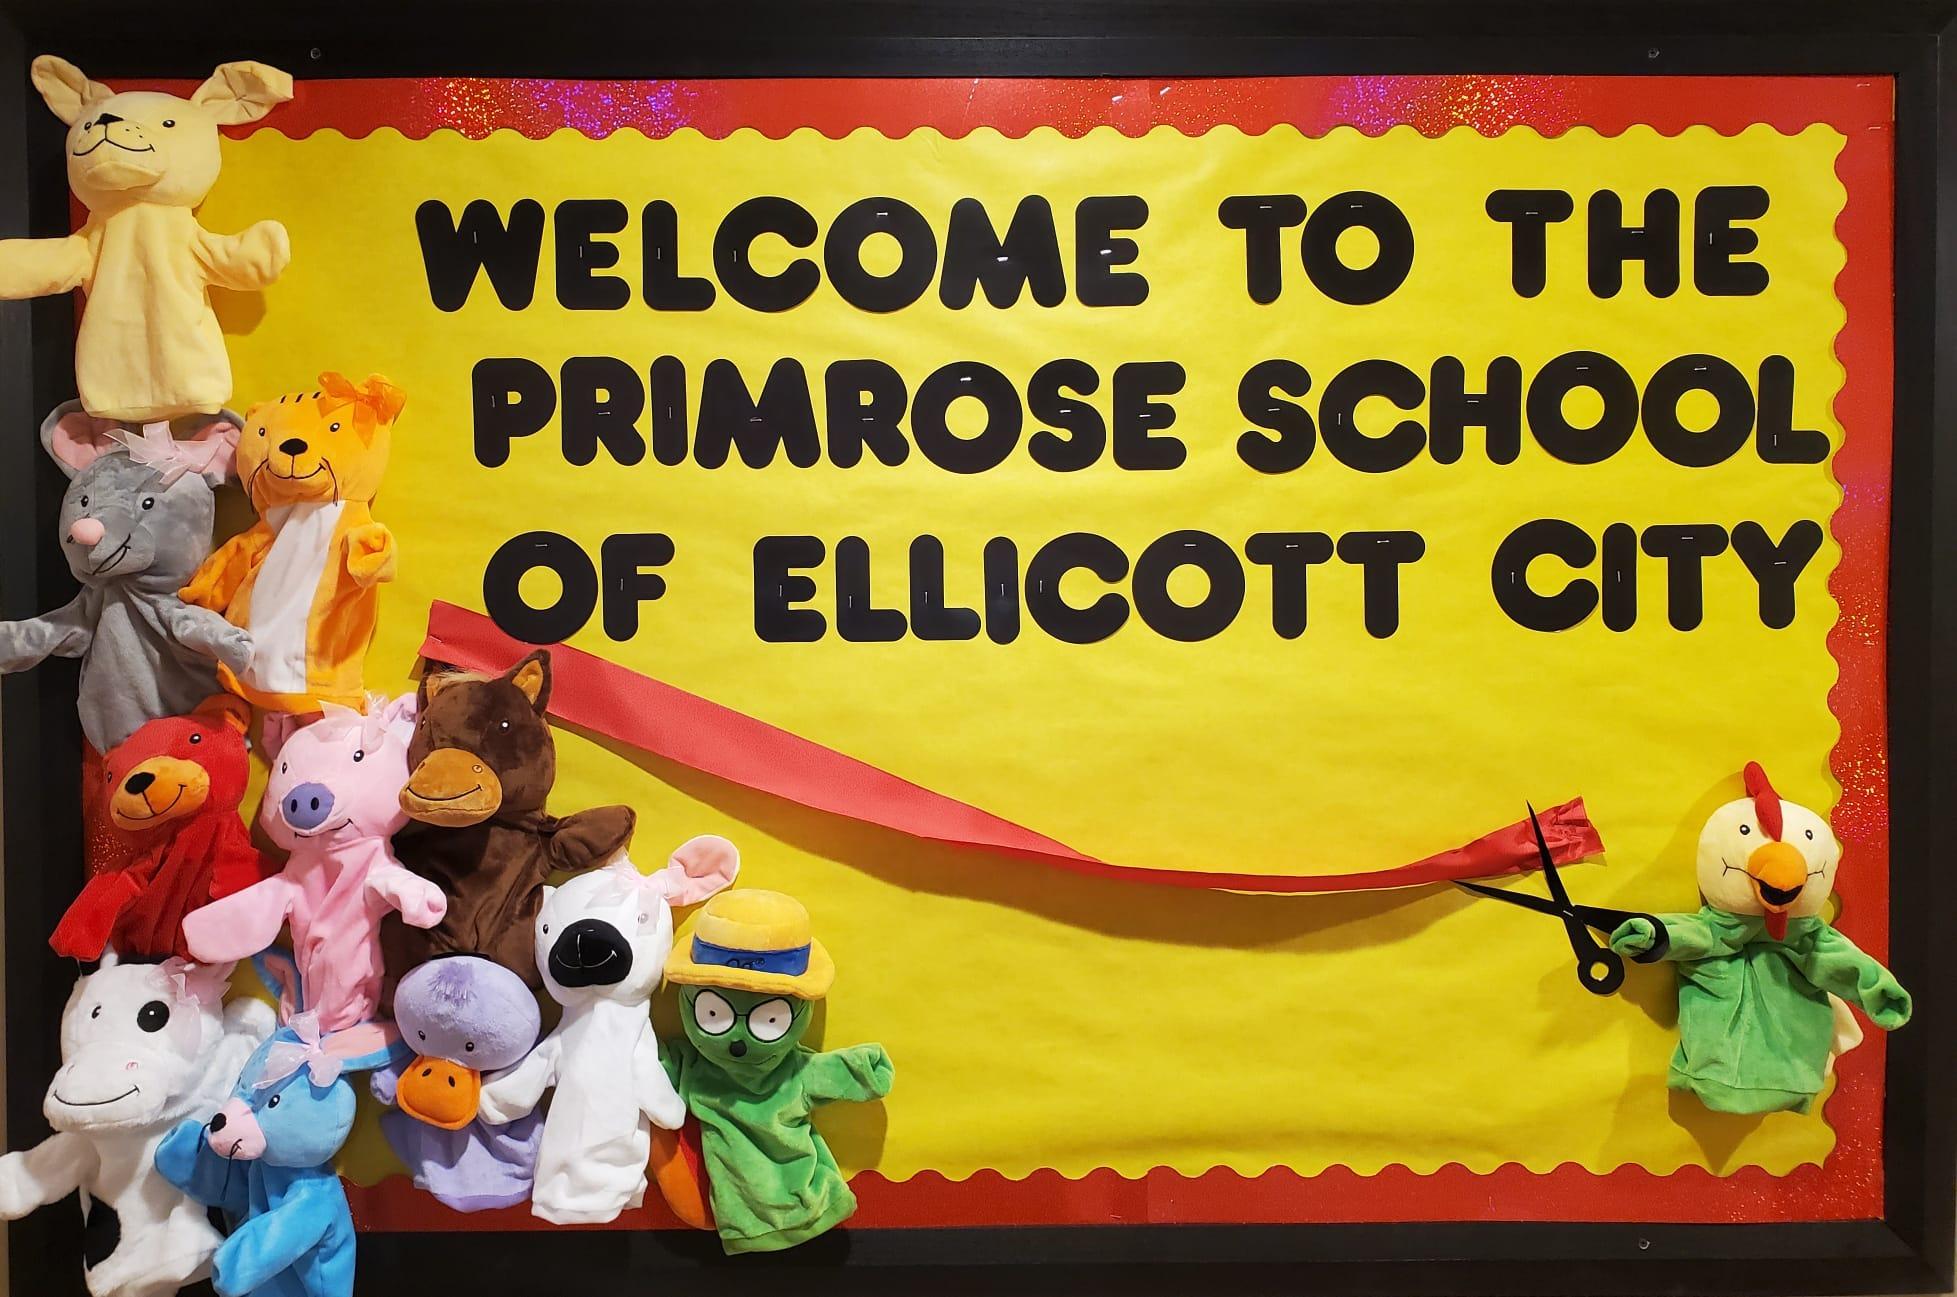 Primrose School of Ellicott City is open now !!